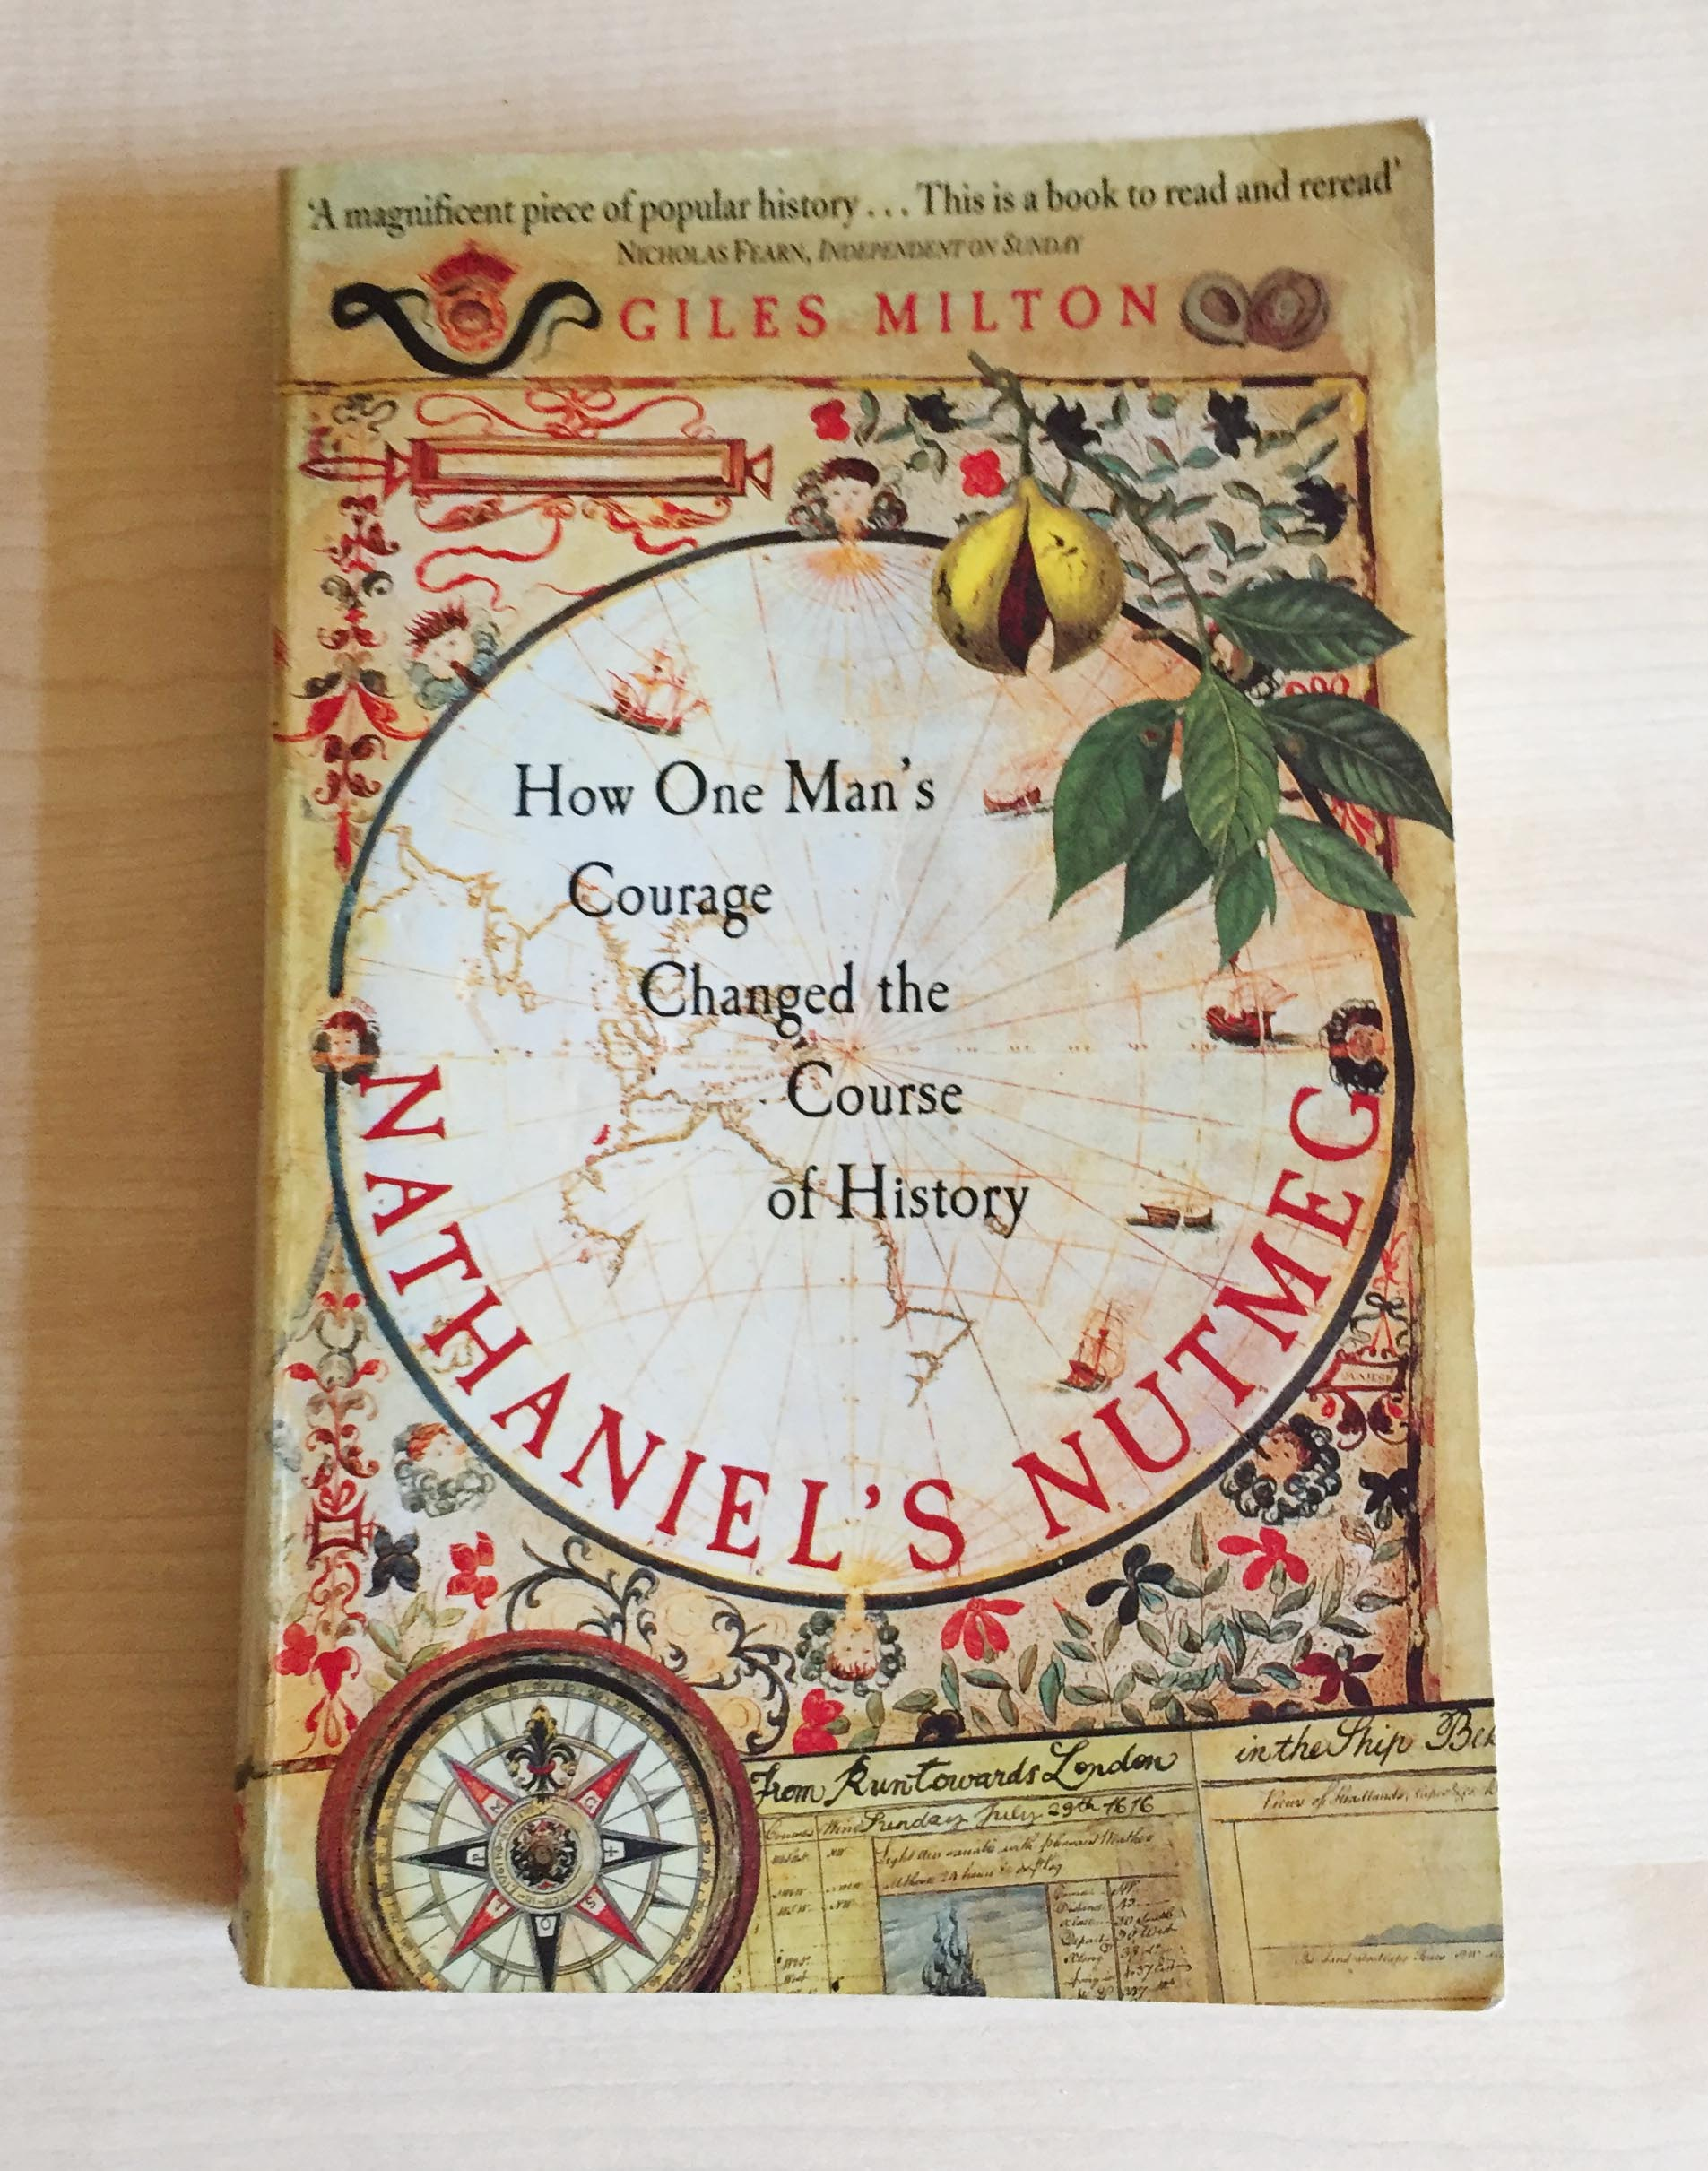 Nathaniel's Nutmeg review